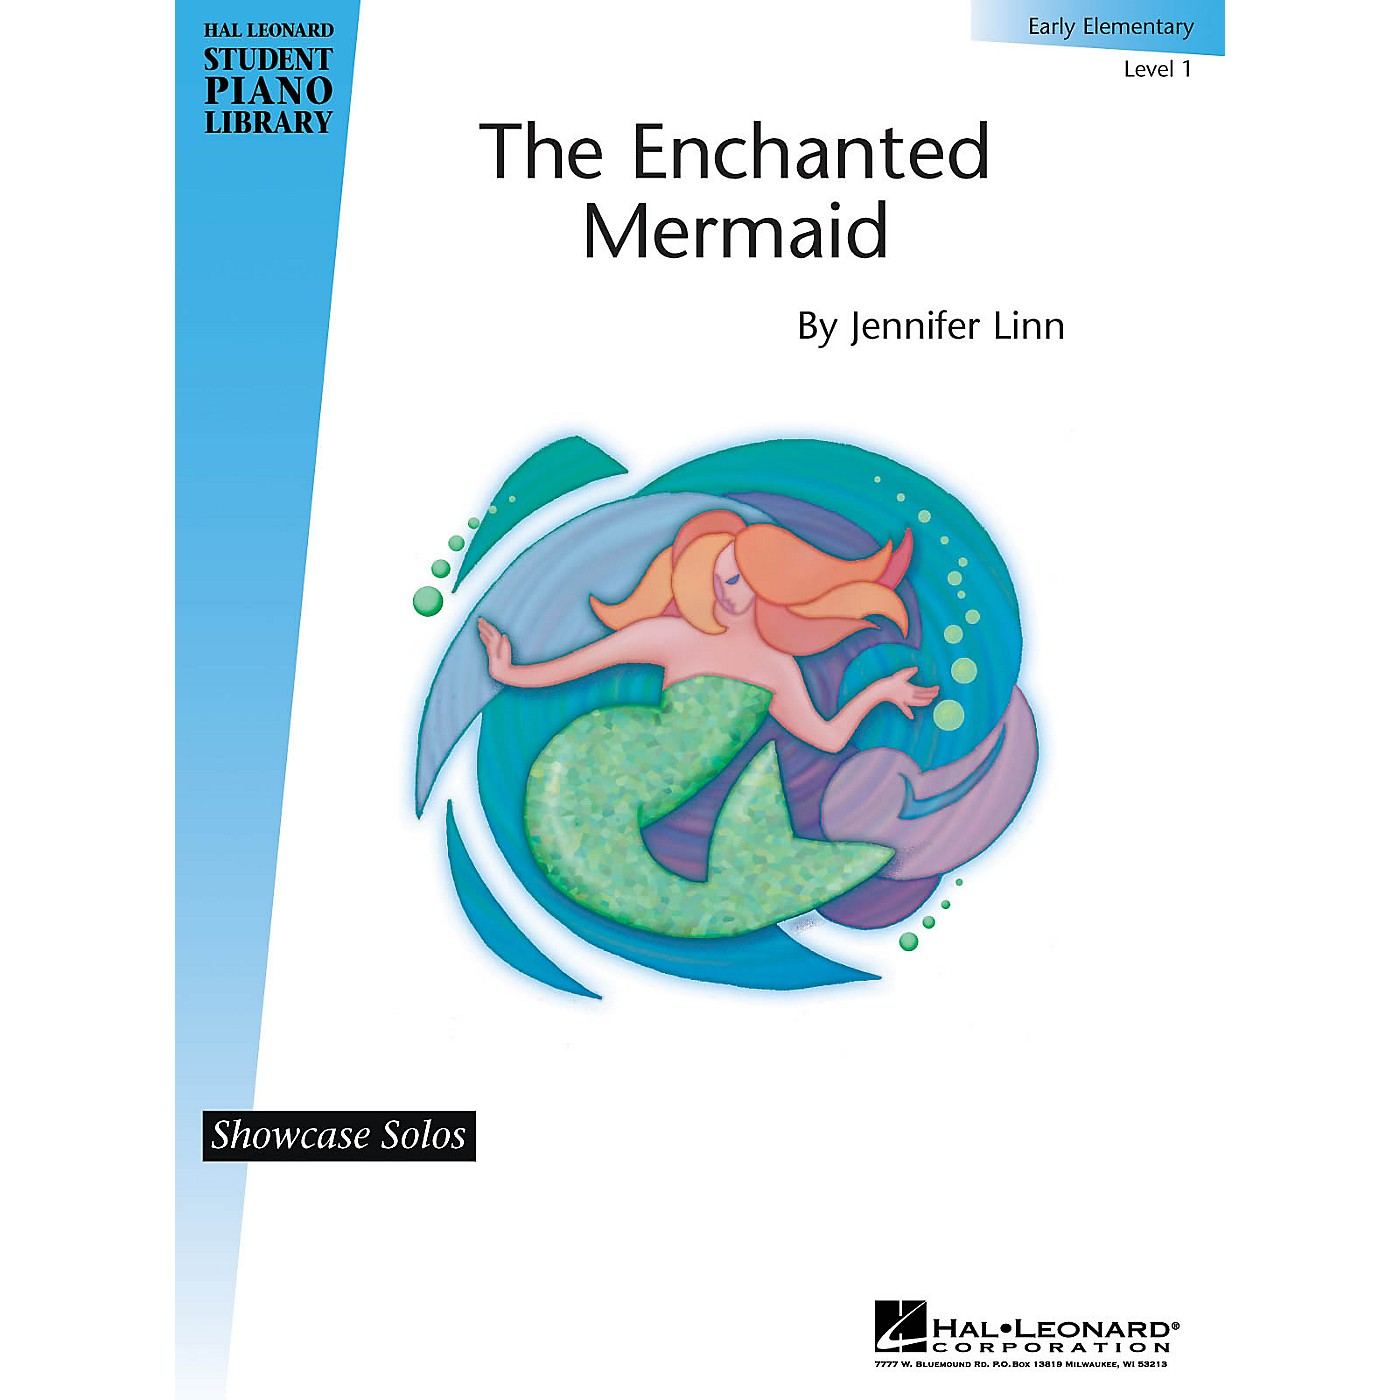 Hal Leonard The Enchanted Mermaid Piano Library Series by Jennifer Linn (Level Early Elem) thumbnail